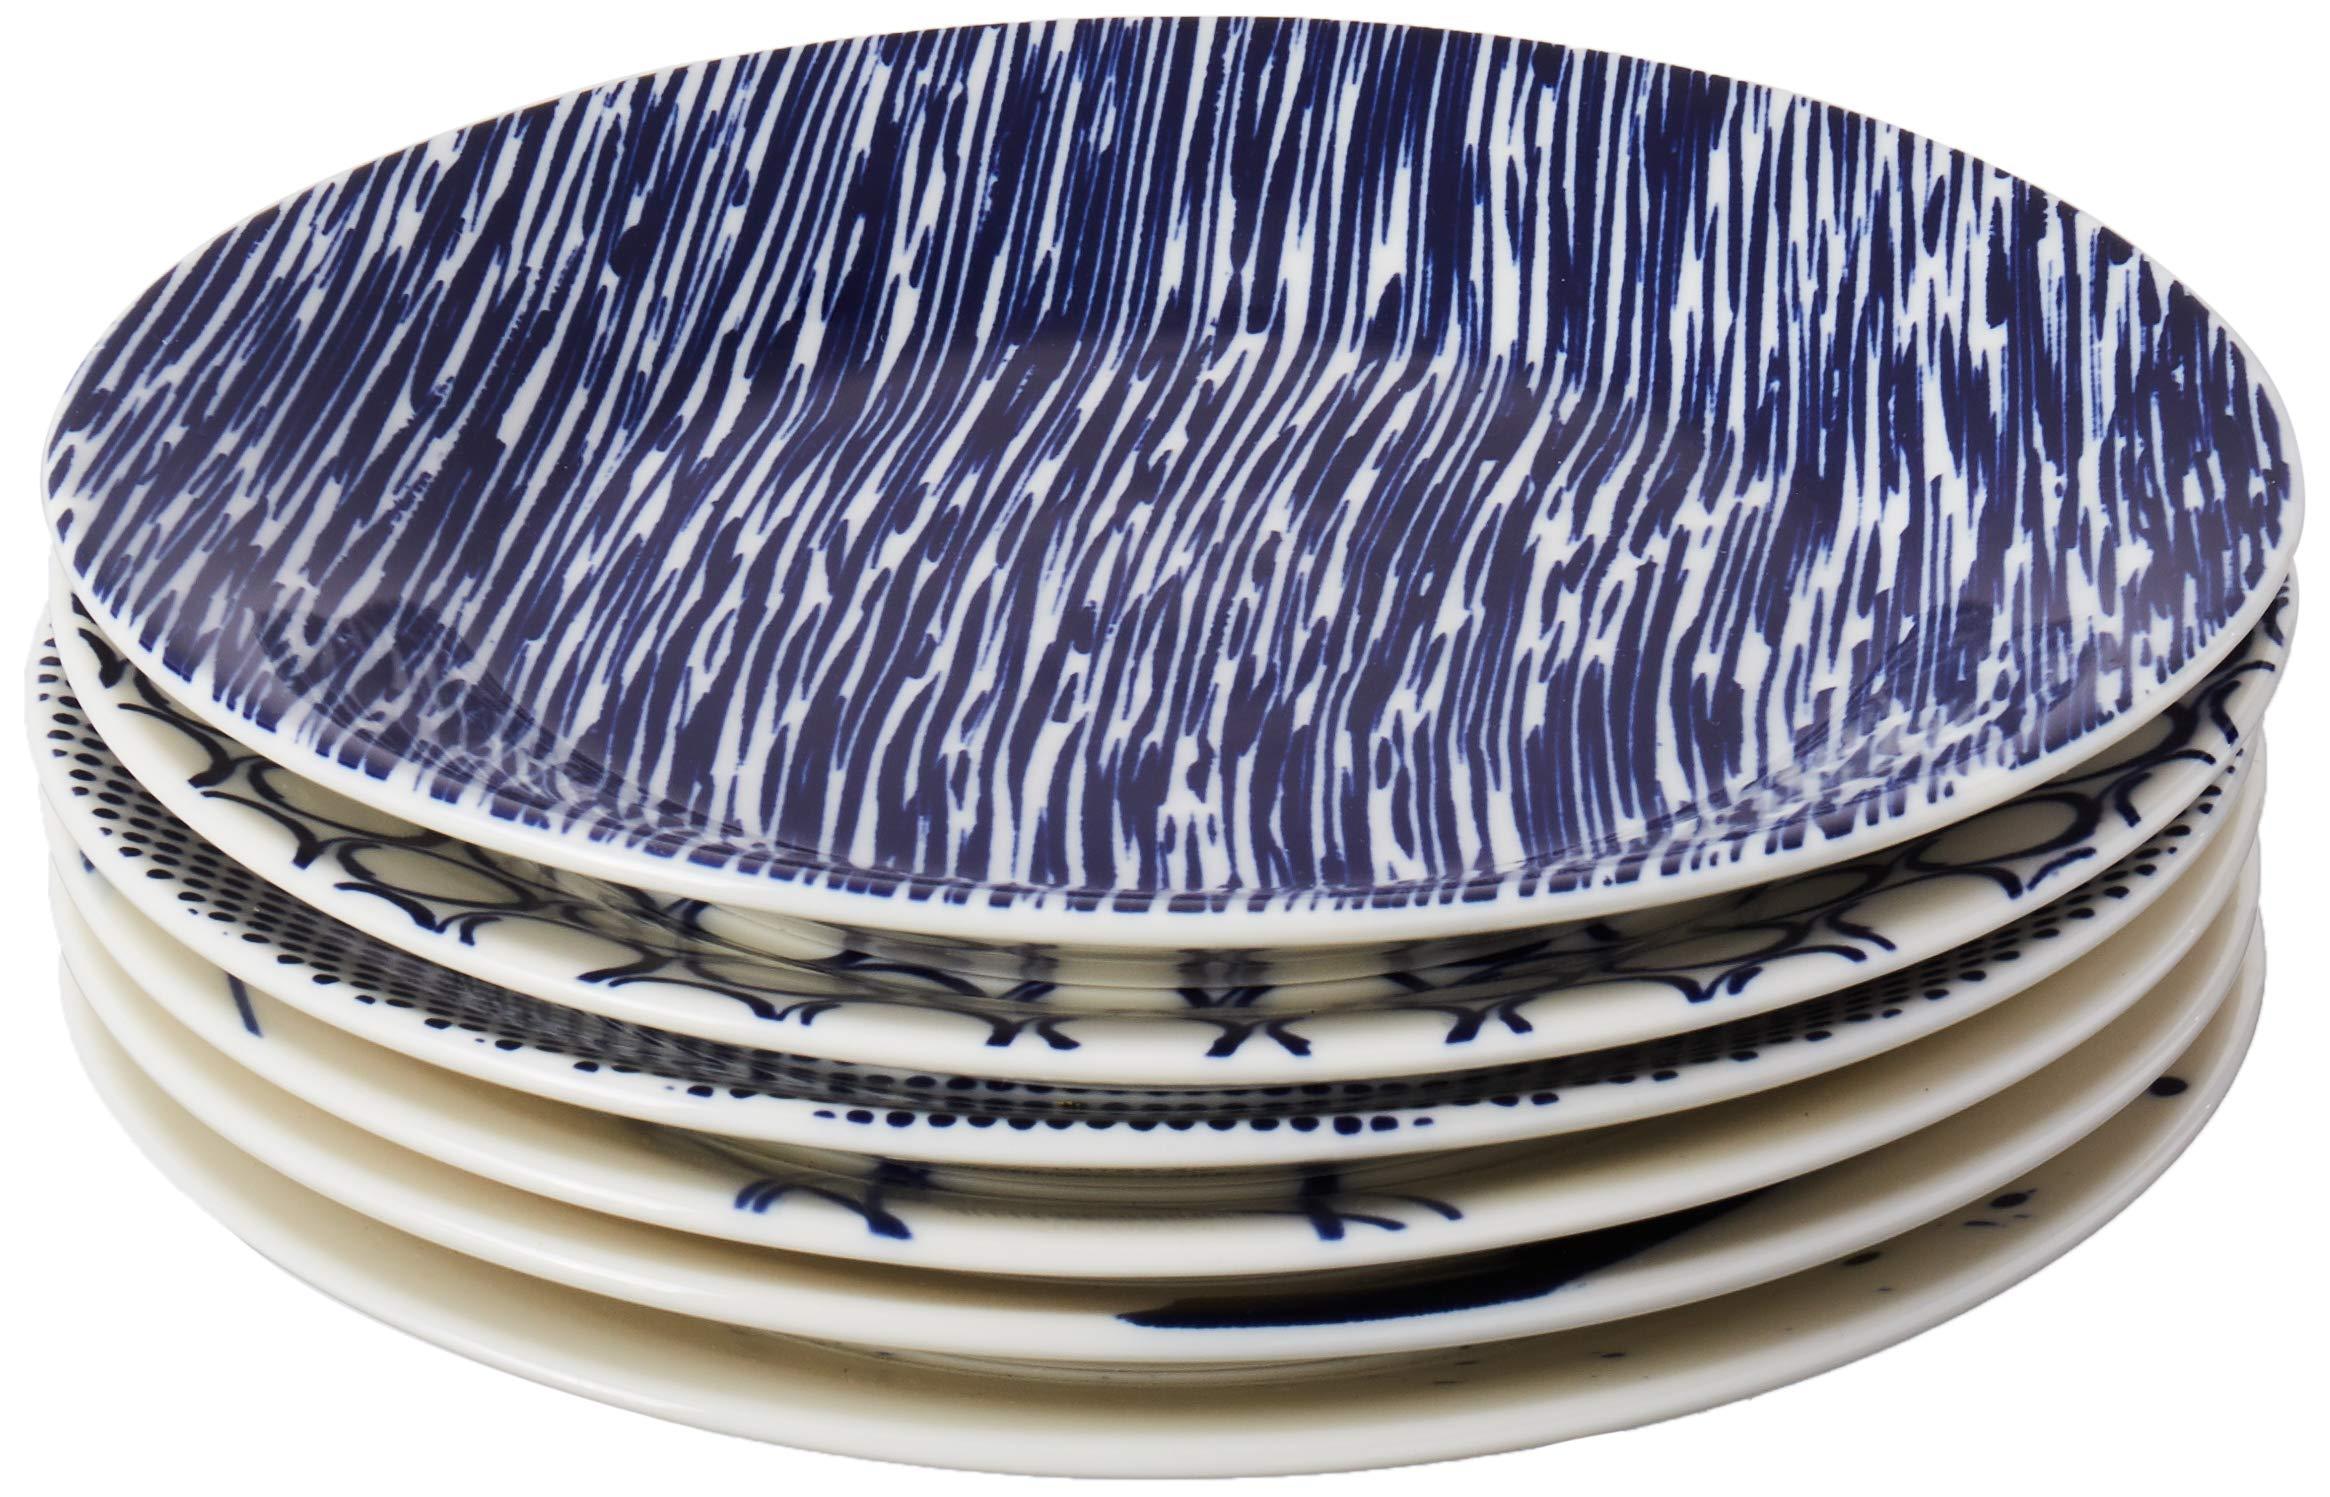 Royal Doulton Pacific Tapas Plates, 6.3-Inch, Blue, Set of 6 by Royal Doulton